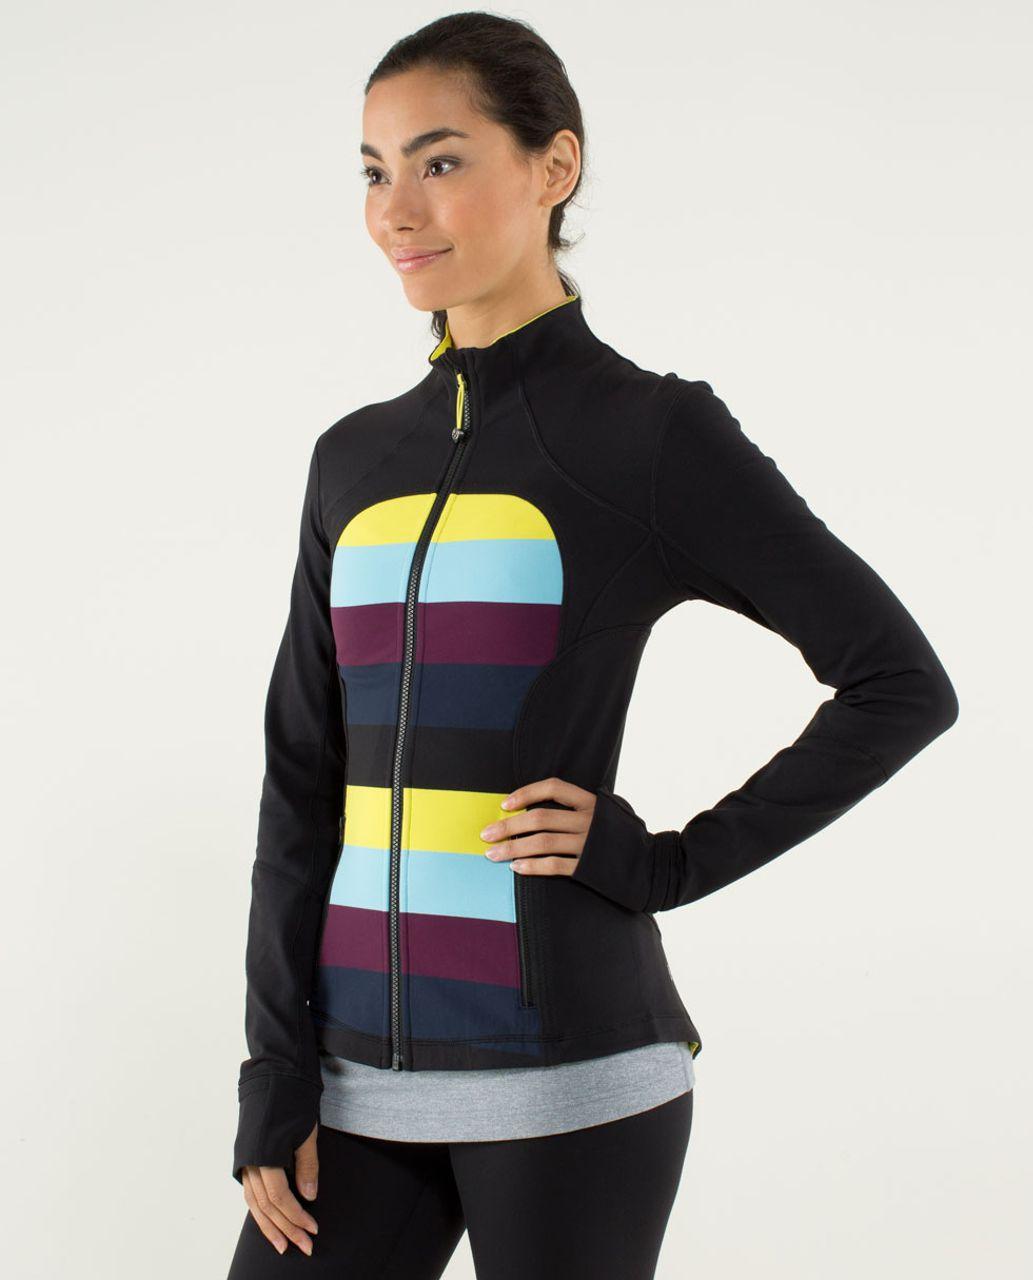 Lululemon Forme Jacket *Cuffins - Pow Stripe Split Pea / Black